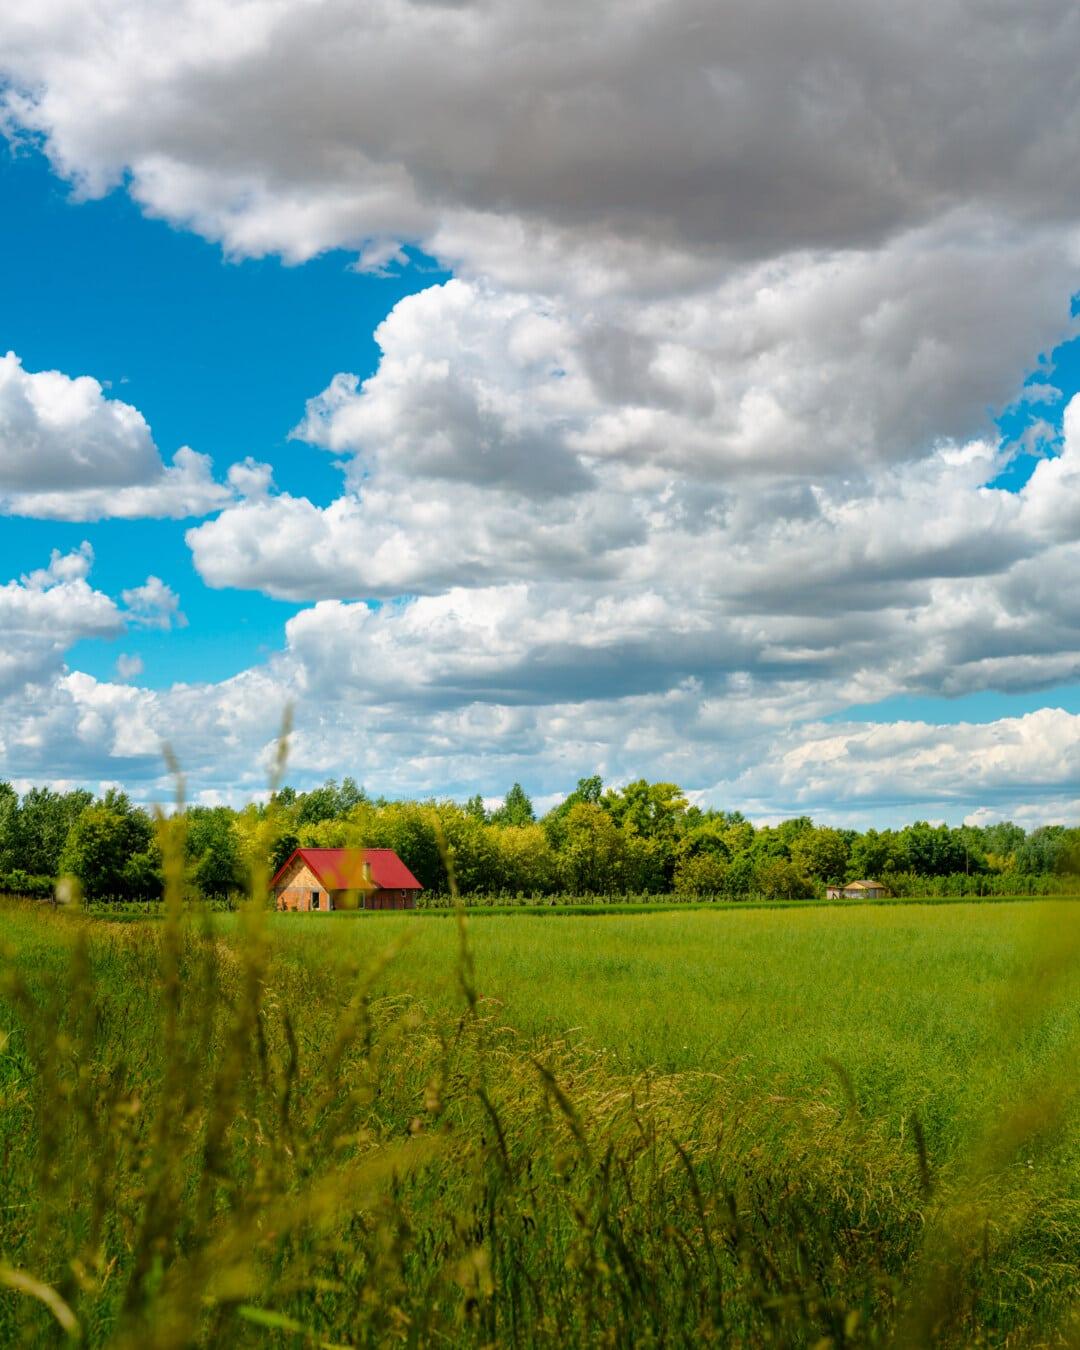 farm, farmhouse, farmland, cloudy, idyllic, spring time, wheatfield, cloud, atmosphere, meadow